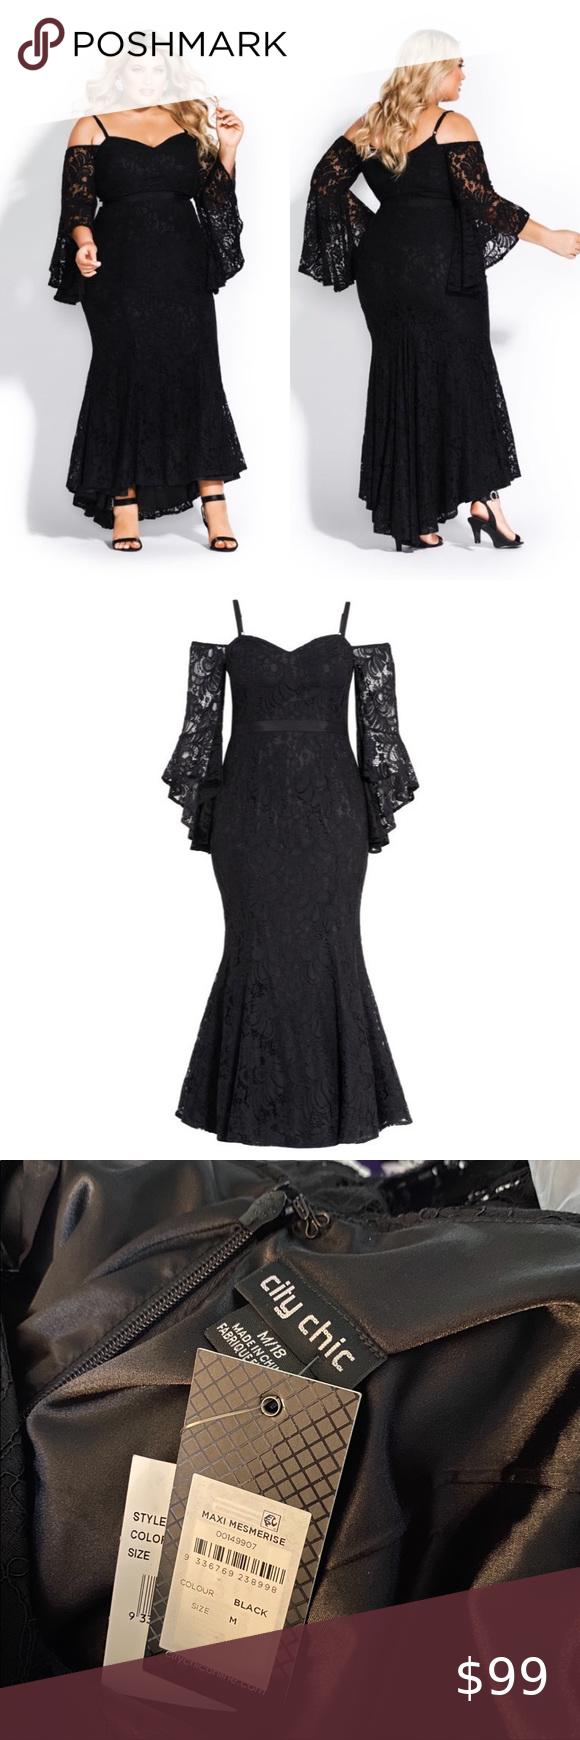 City Chic Mesmerize Maxi Dress Black Lace M 18 Lace Dress Black Black Maxi Dress Black Dress [ 1740 x 580 Pixel ]